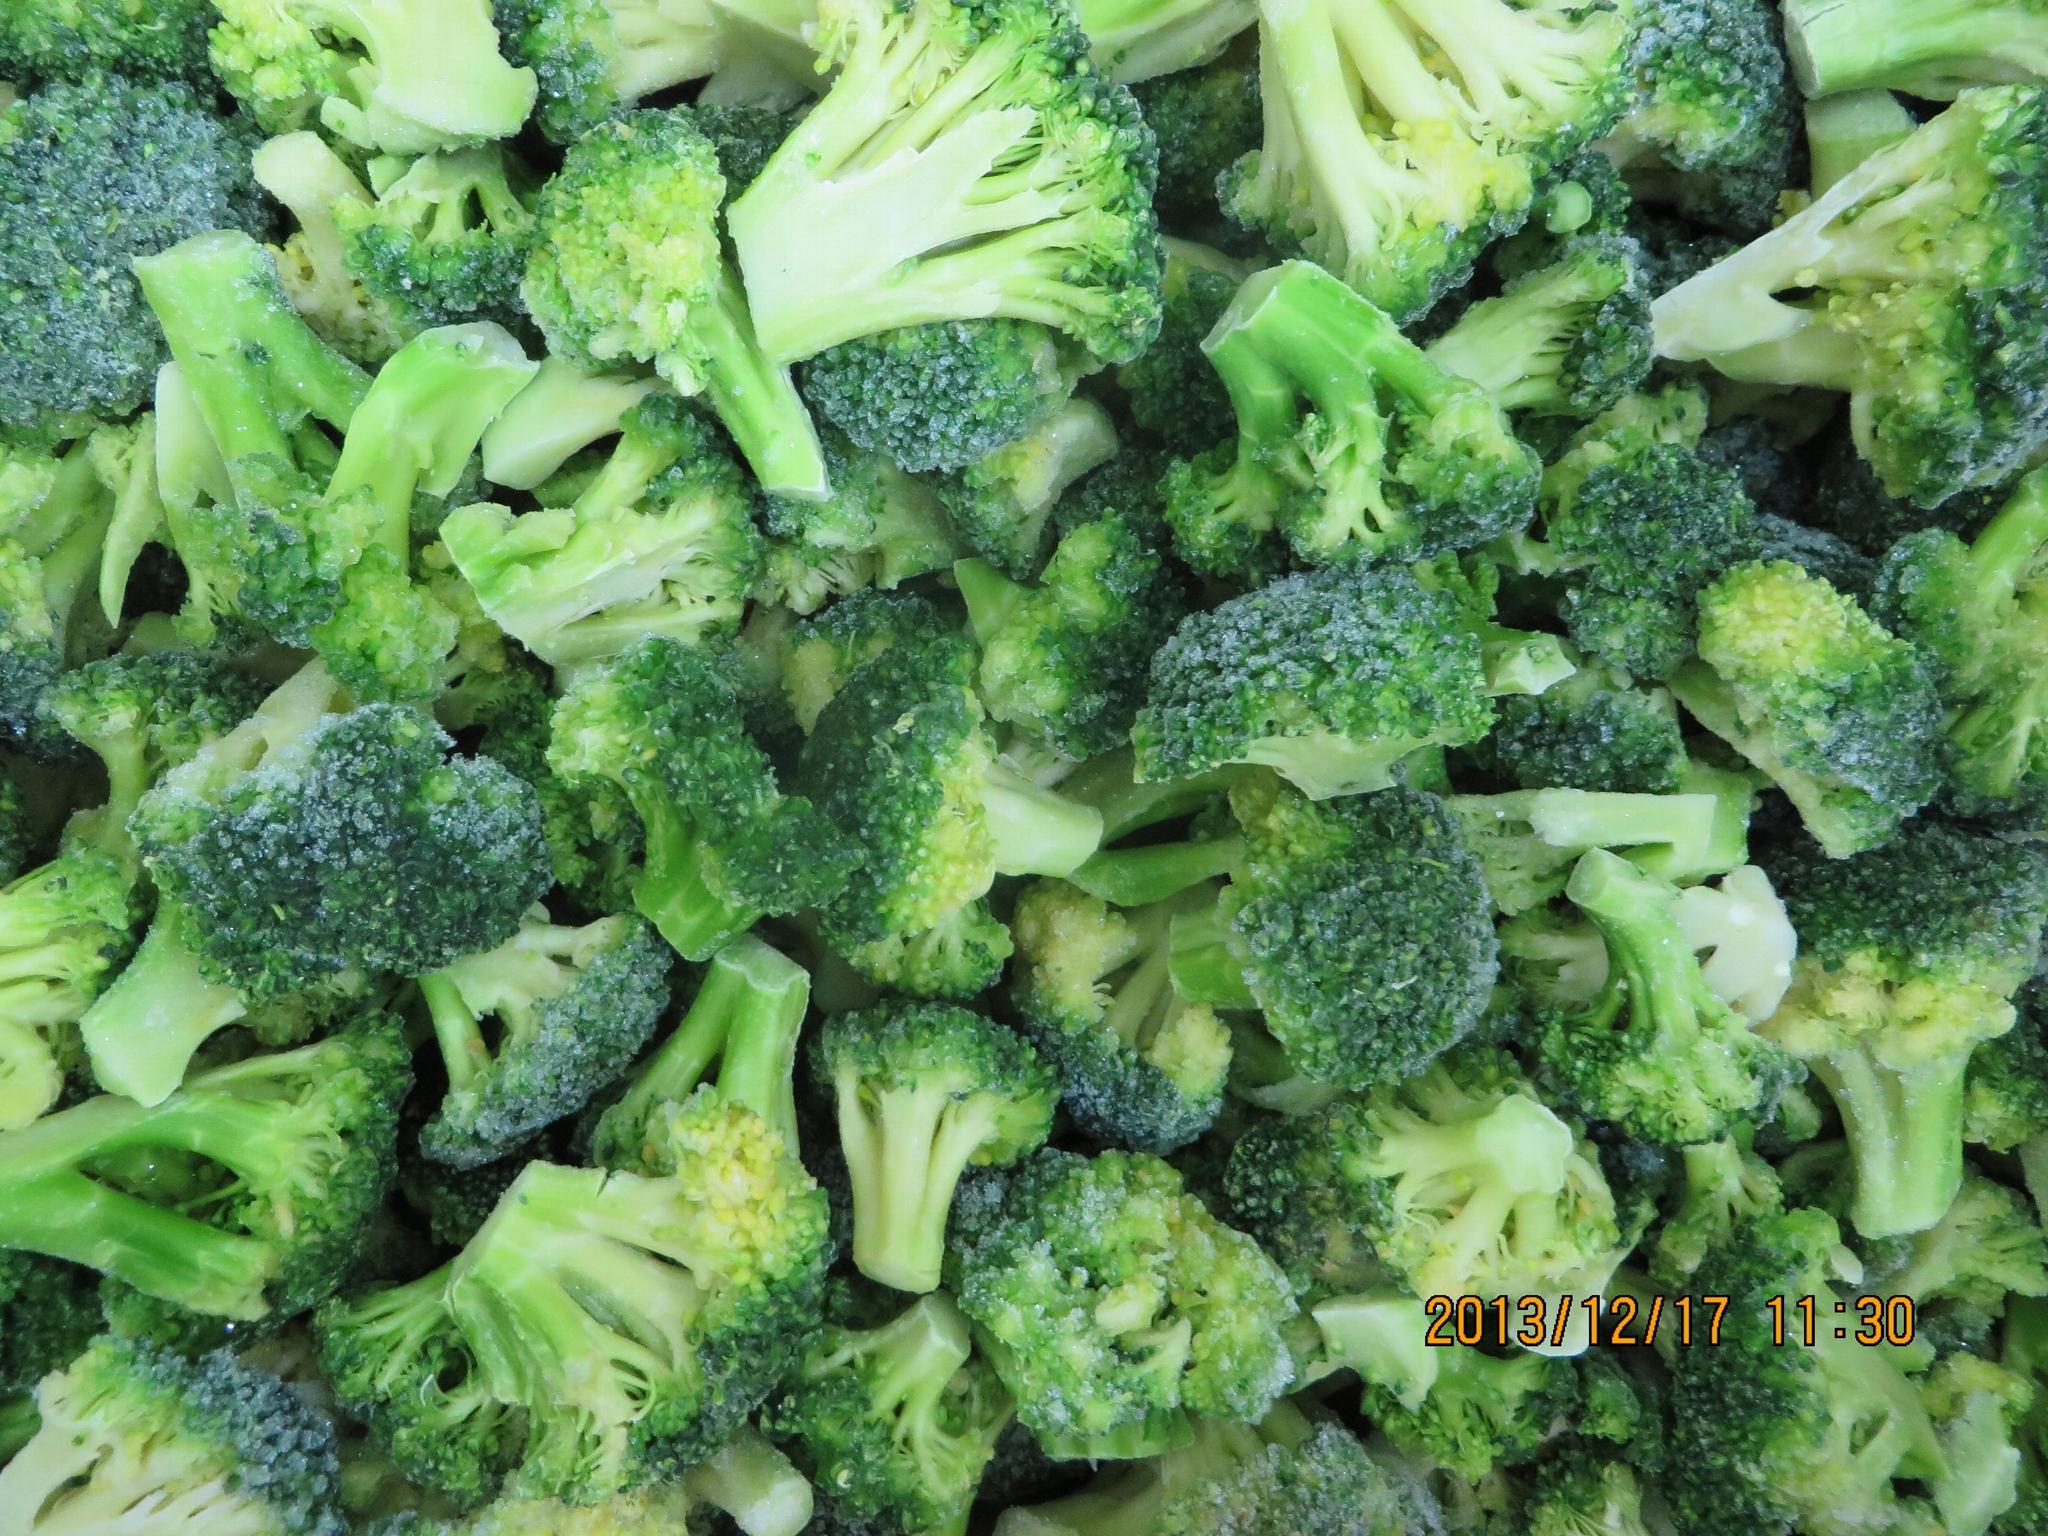 IQF Cut broccoli,Frozen Cut Broccoli,BQF broccoli spears